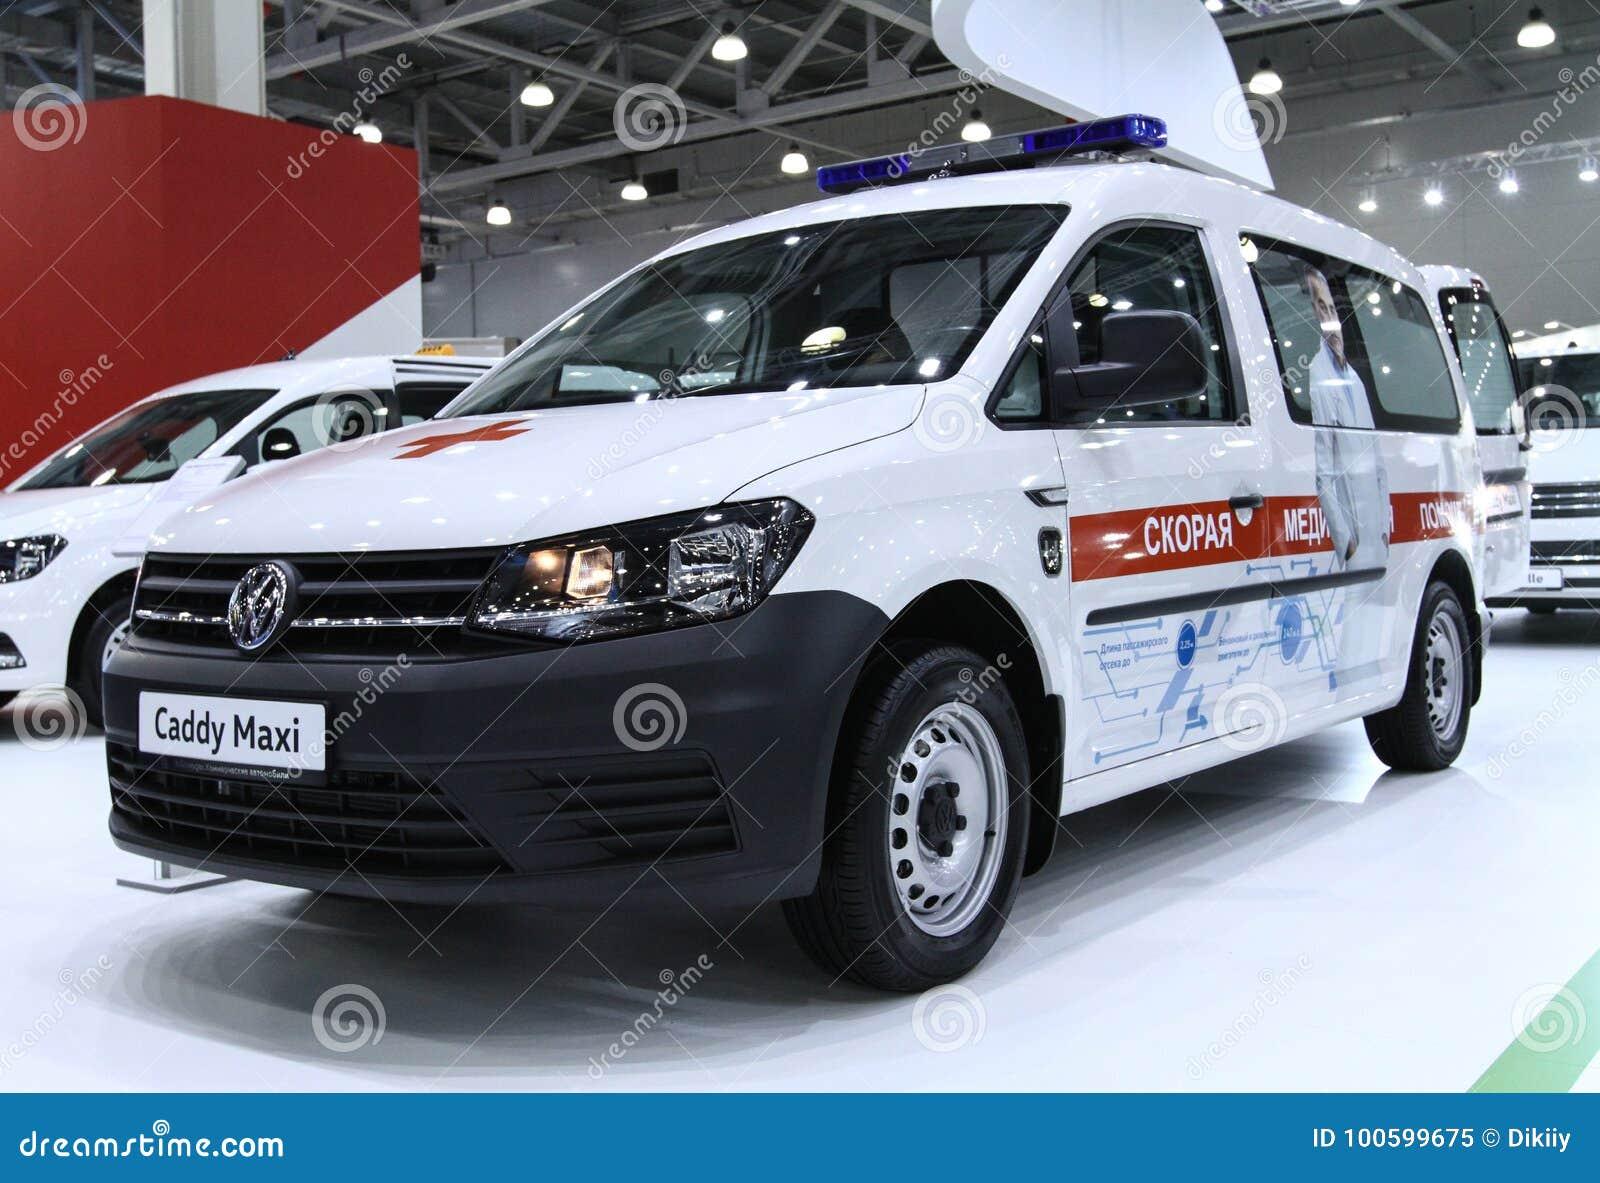 VW Caddy Maxi ambulance editorial image  Image of maxi - 100599675